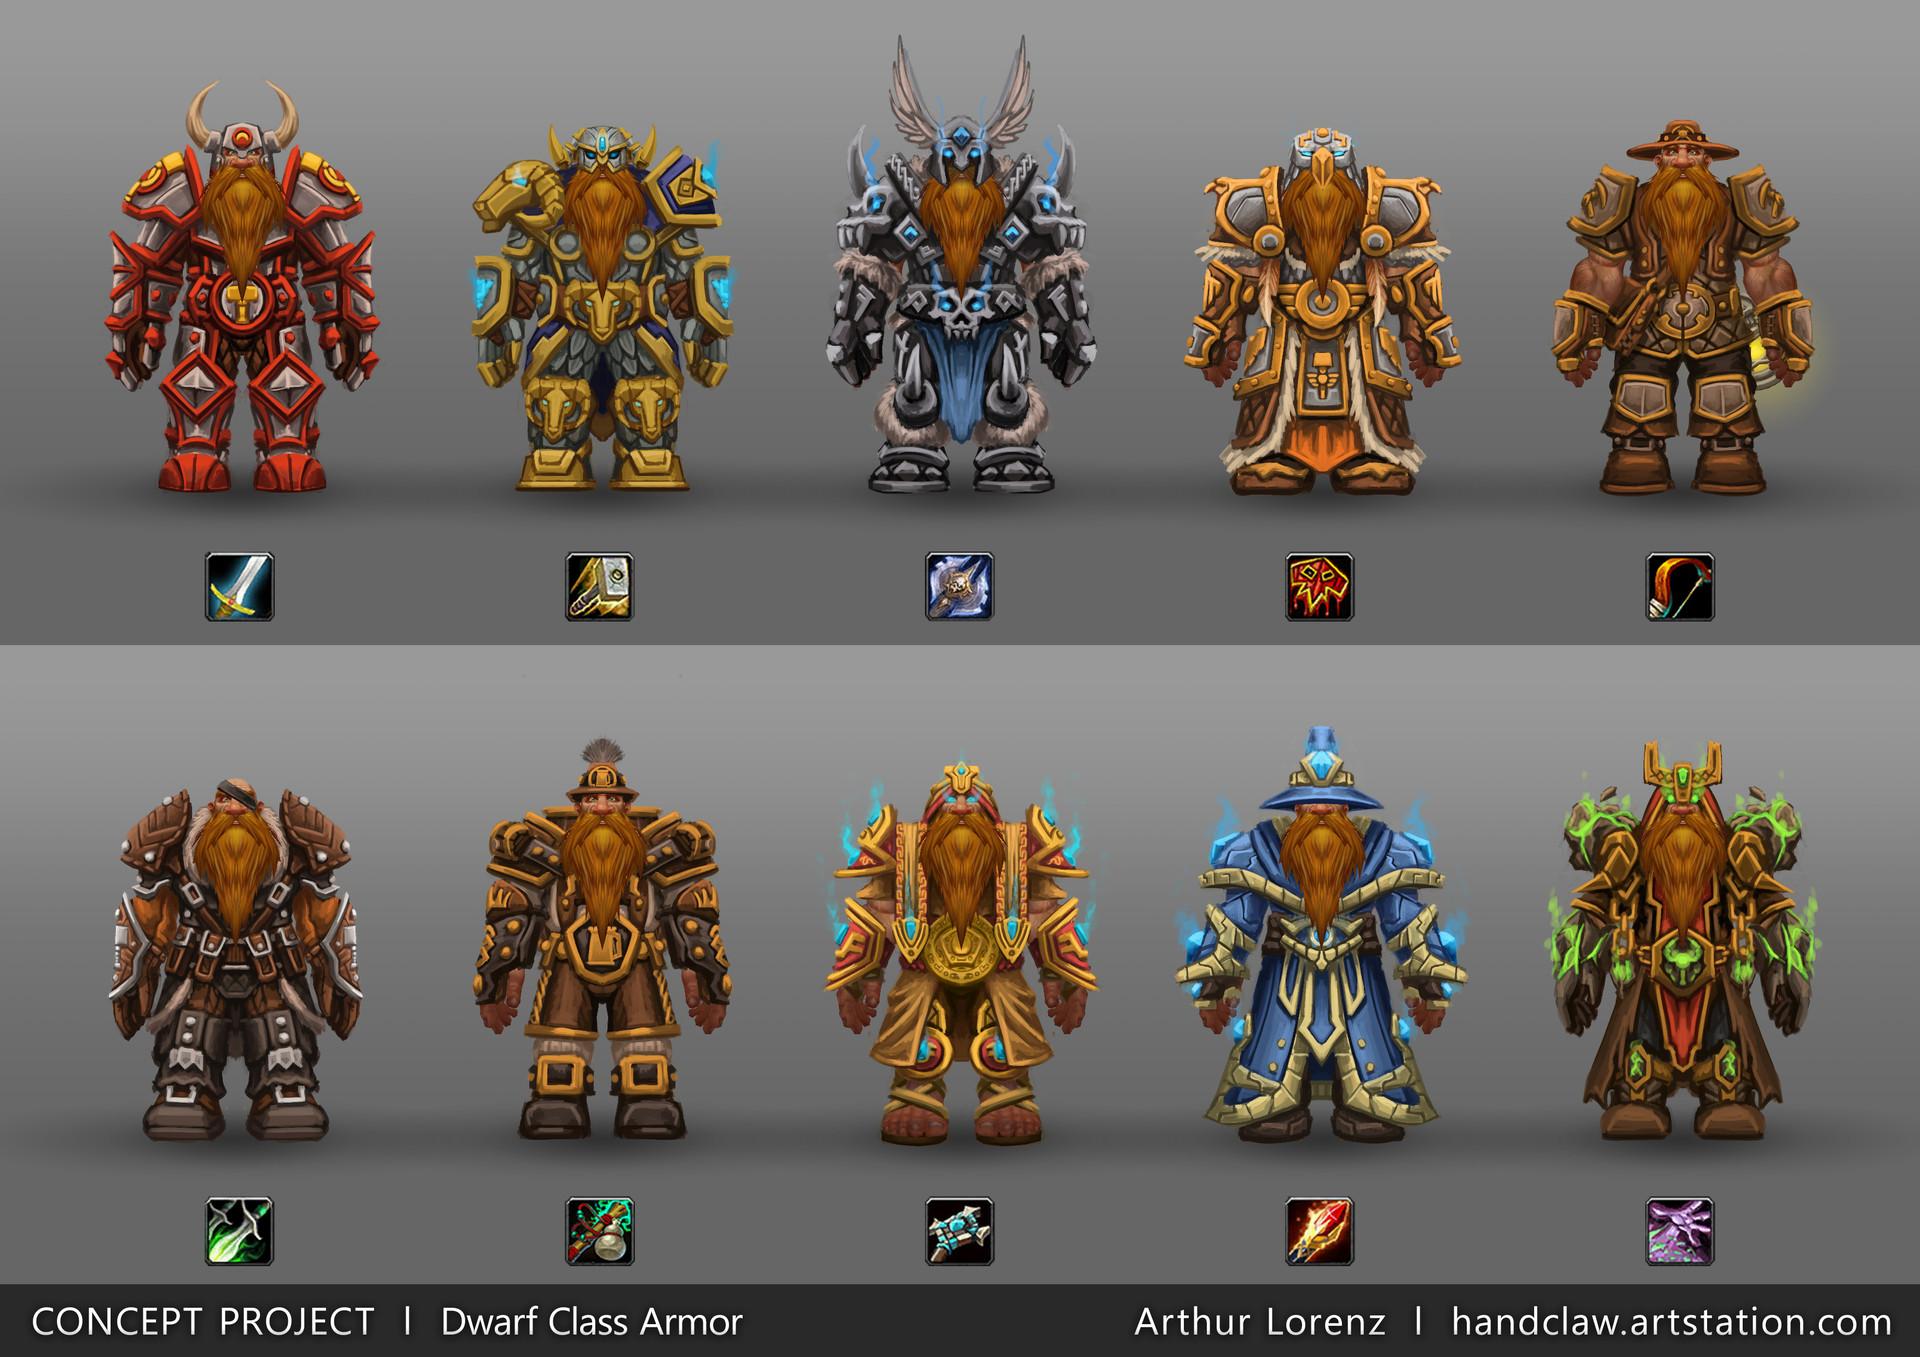 arthur-lorenz-artstation-dwarves.jpg?154